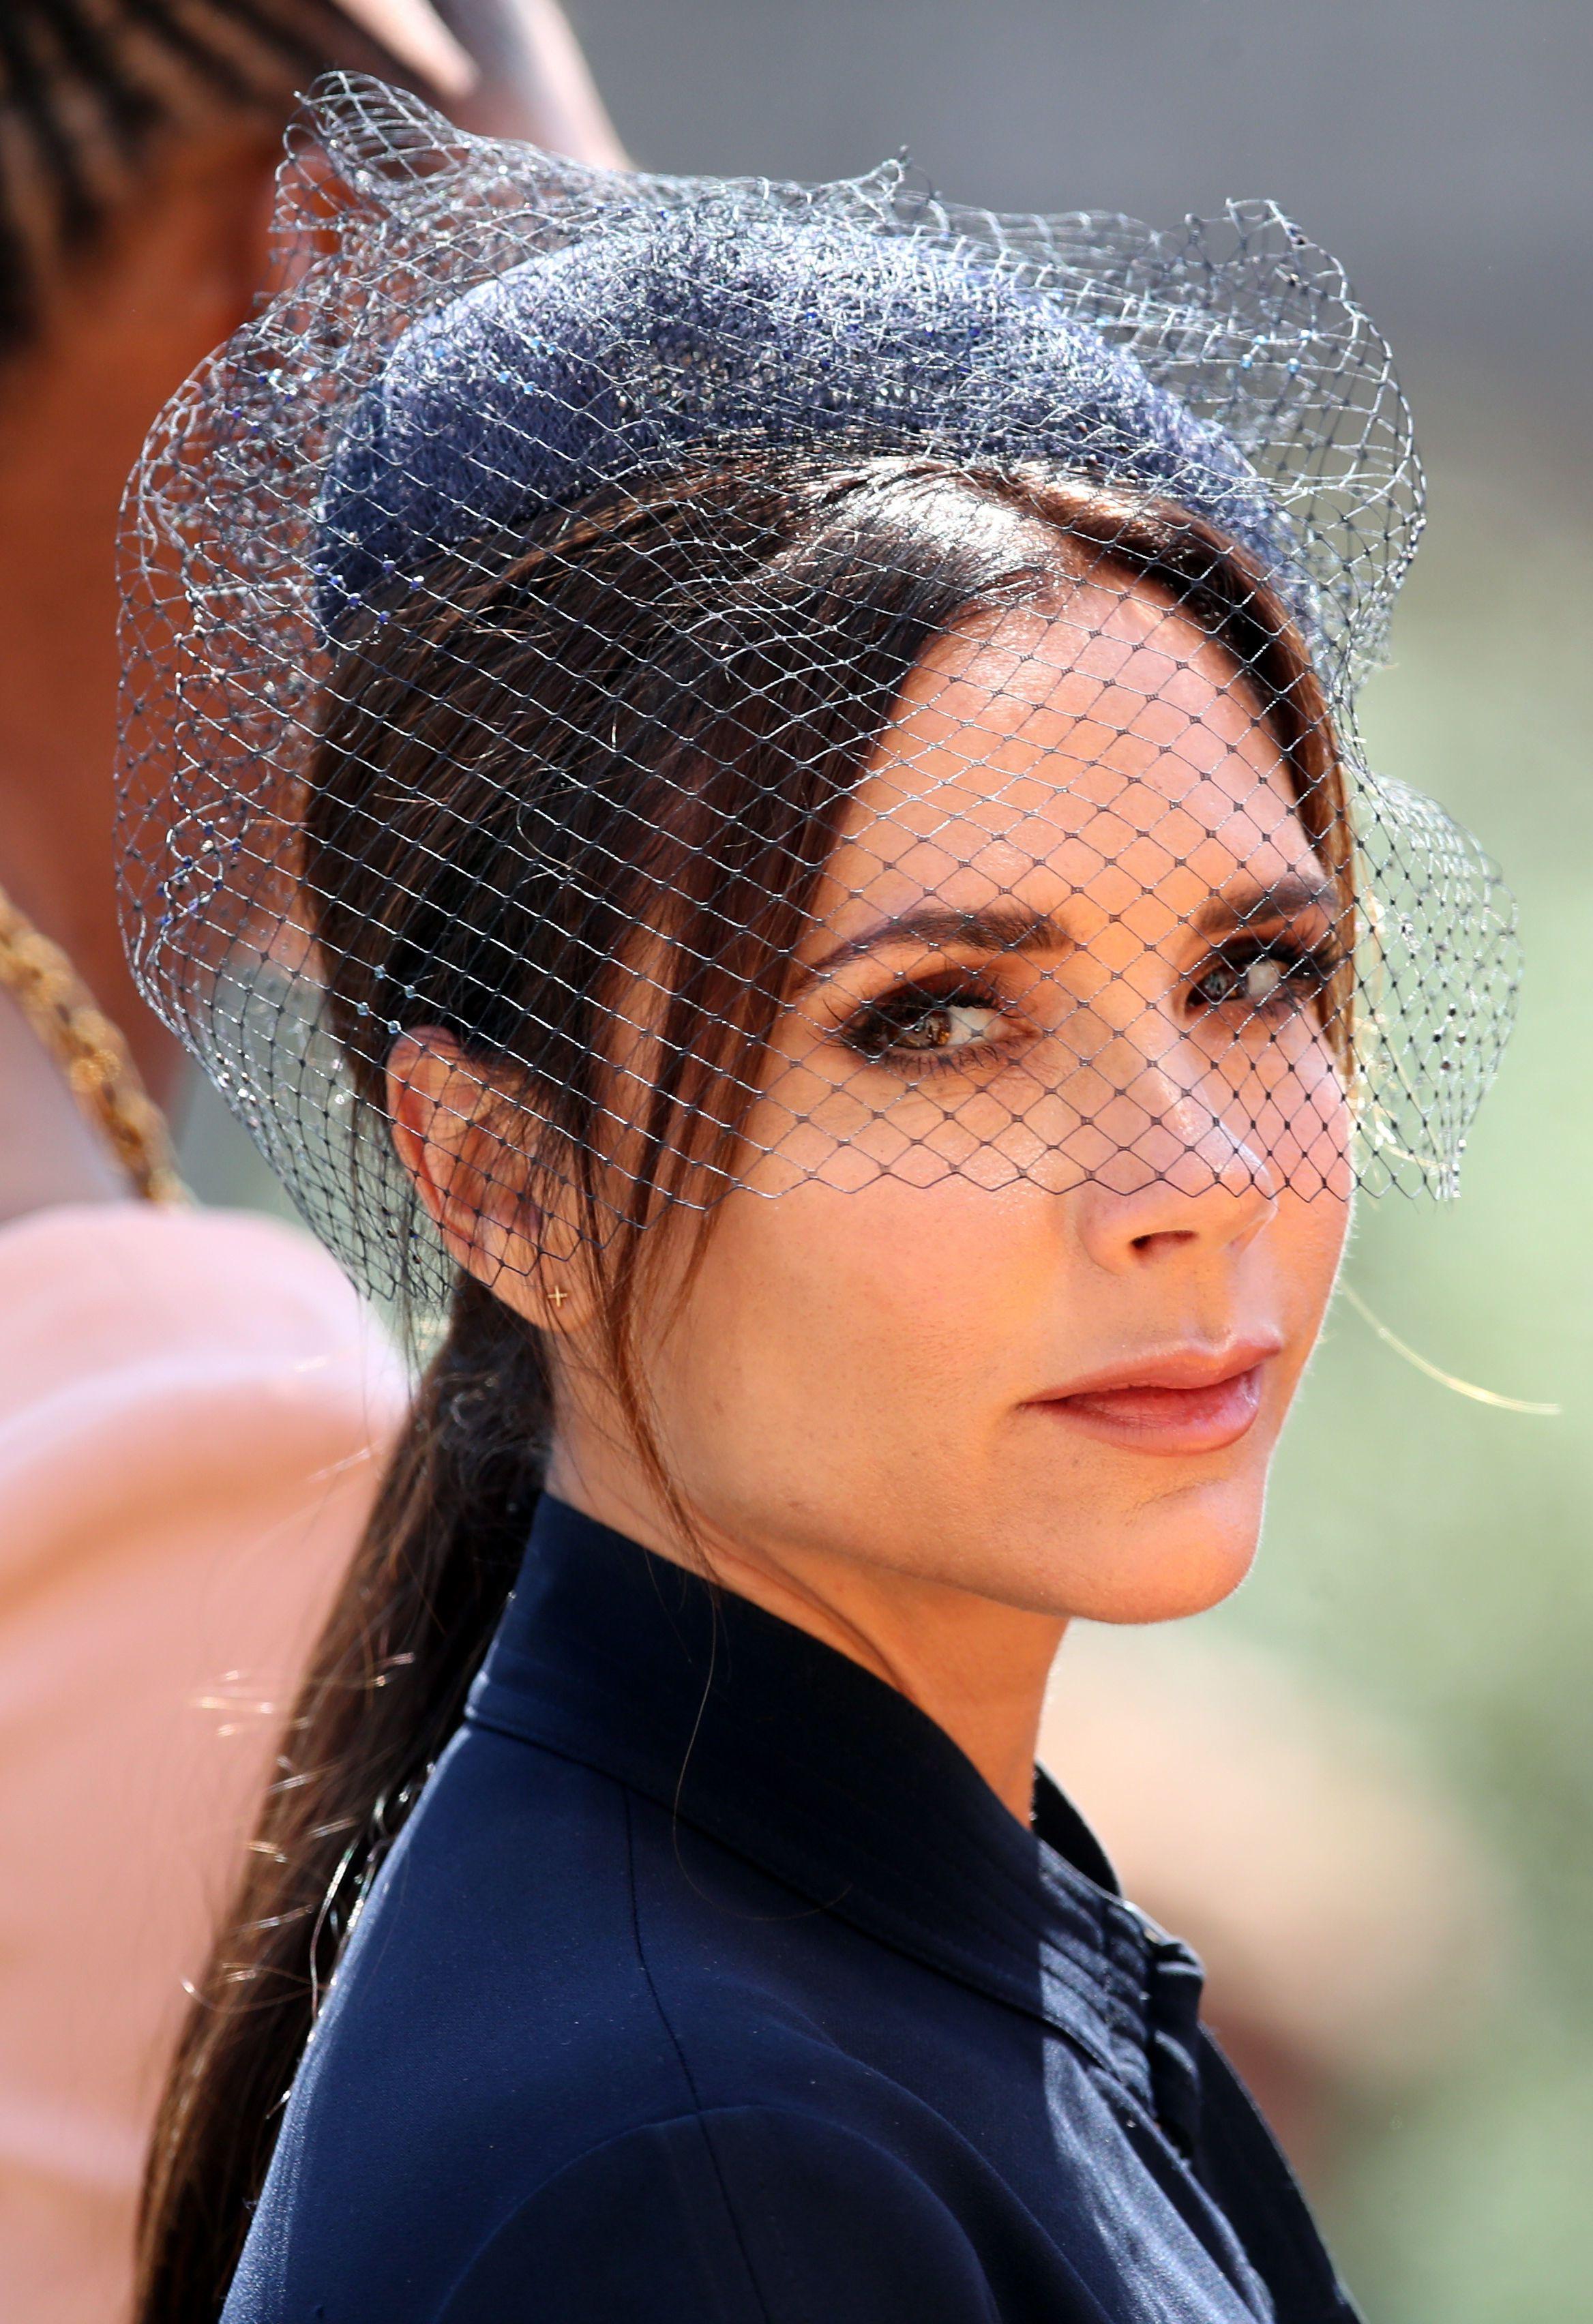 Royal Wedding Fascinators — Hats and Hatinators at Meghan and Harrys  Ceremony ceafef31631